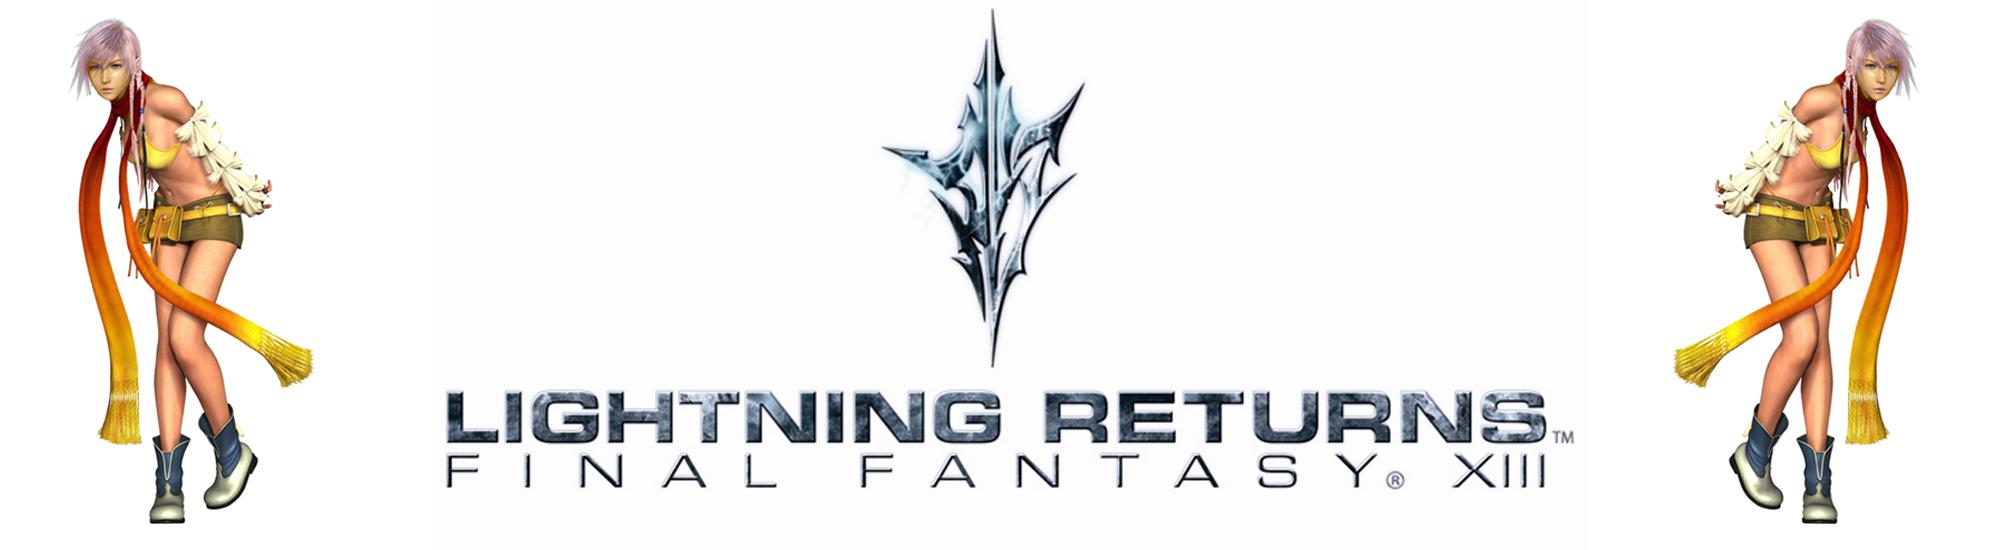 Lightning Returns - Rikku Thief Outfit by 2barquack